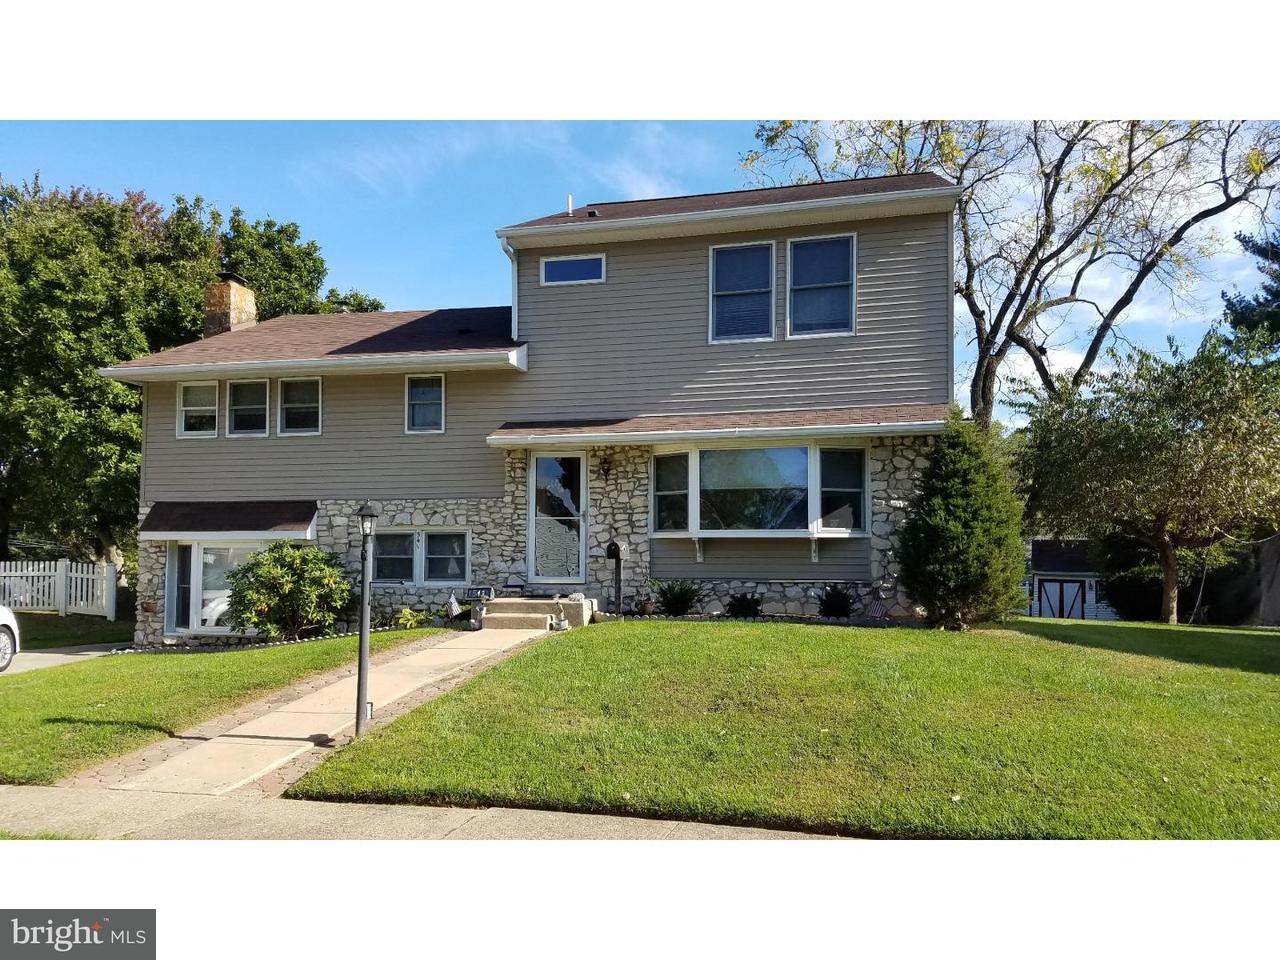 Single Family Home for Sale at 541 CLARISSA Avenue Penndel, Pennsylvania 19047 United States